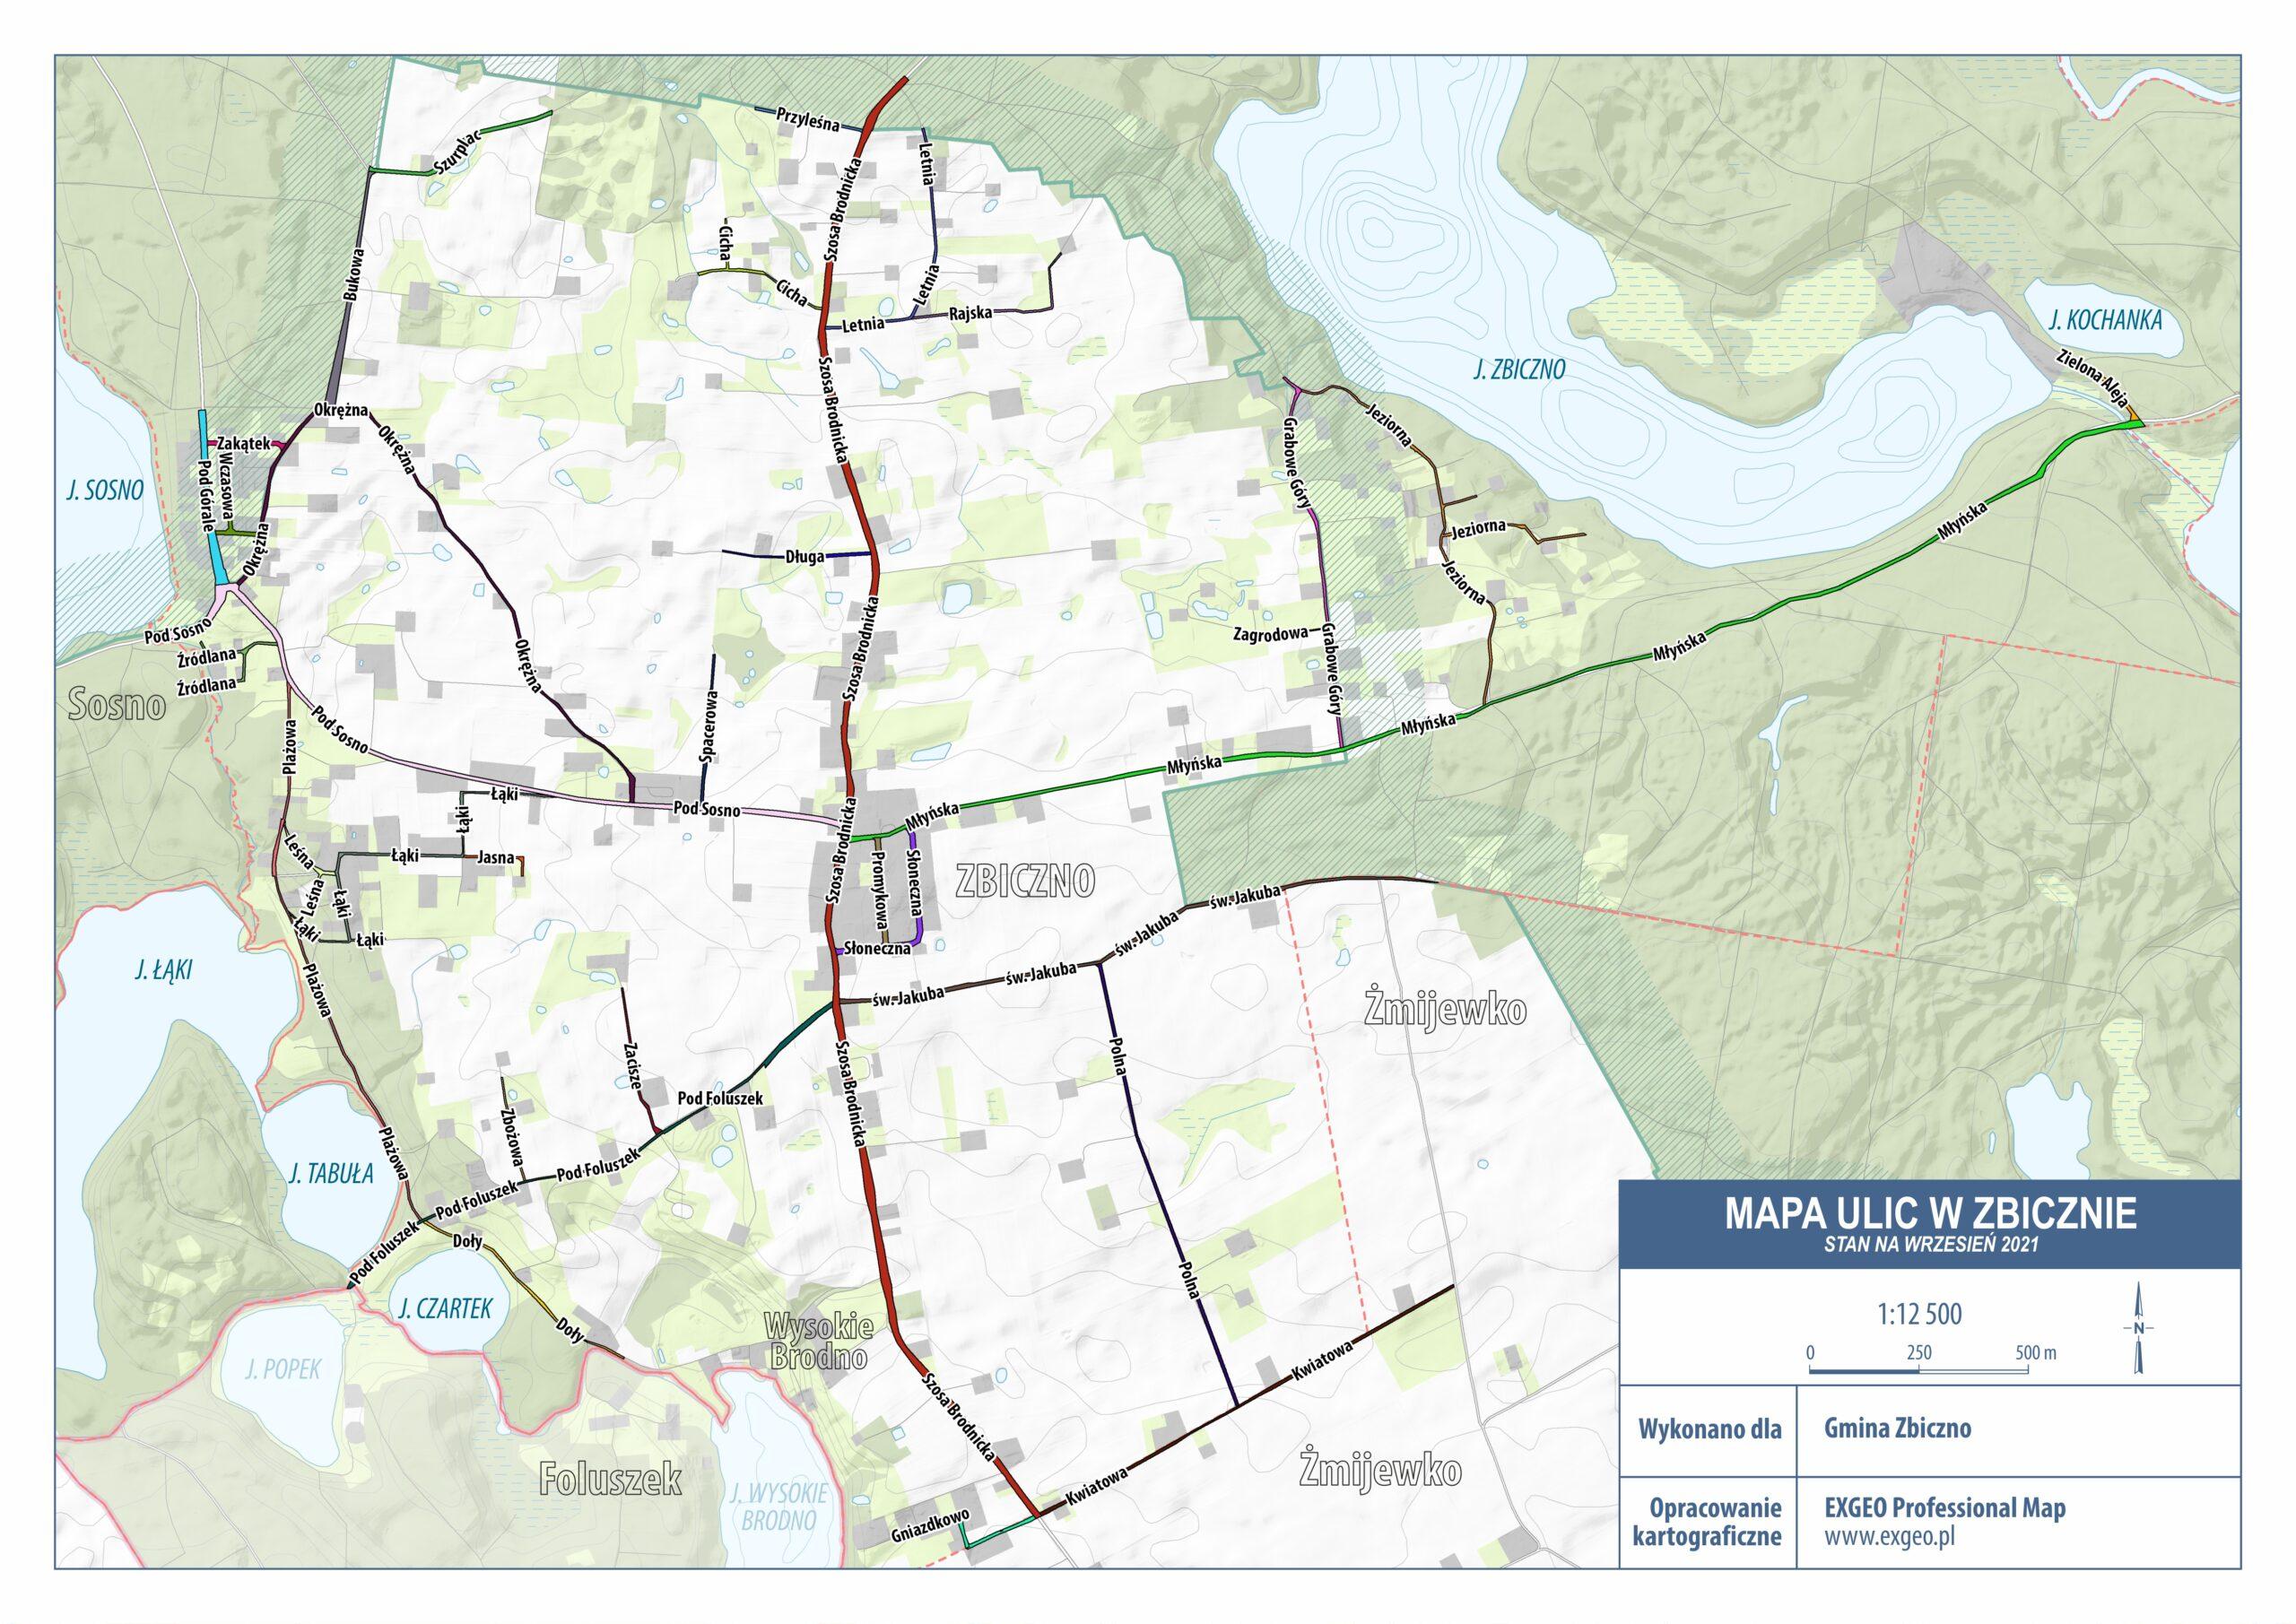 Mapa ulic